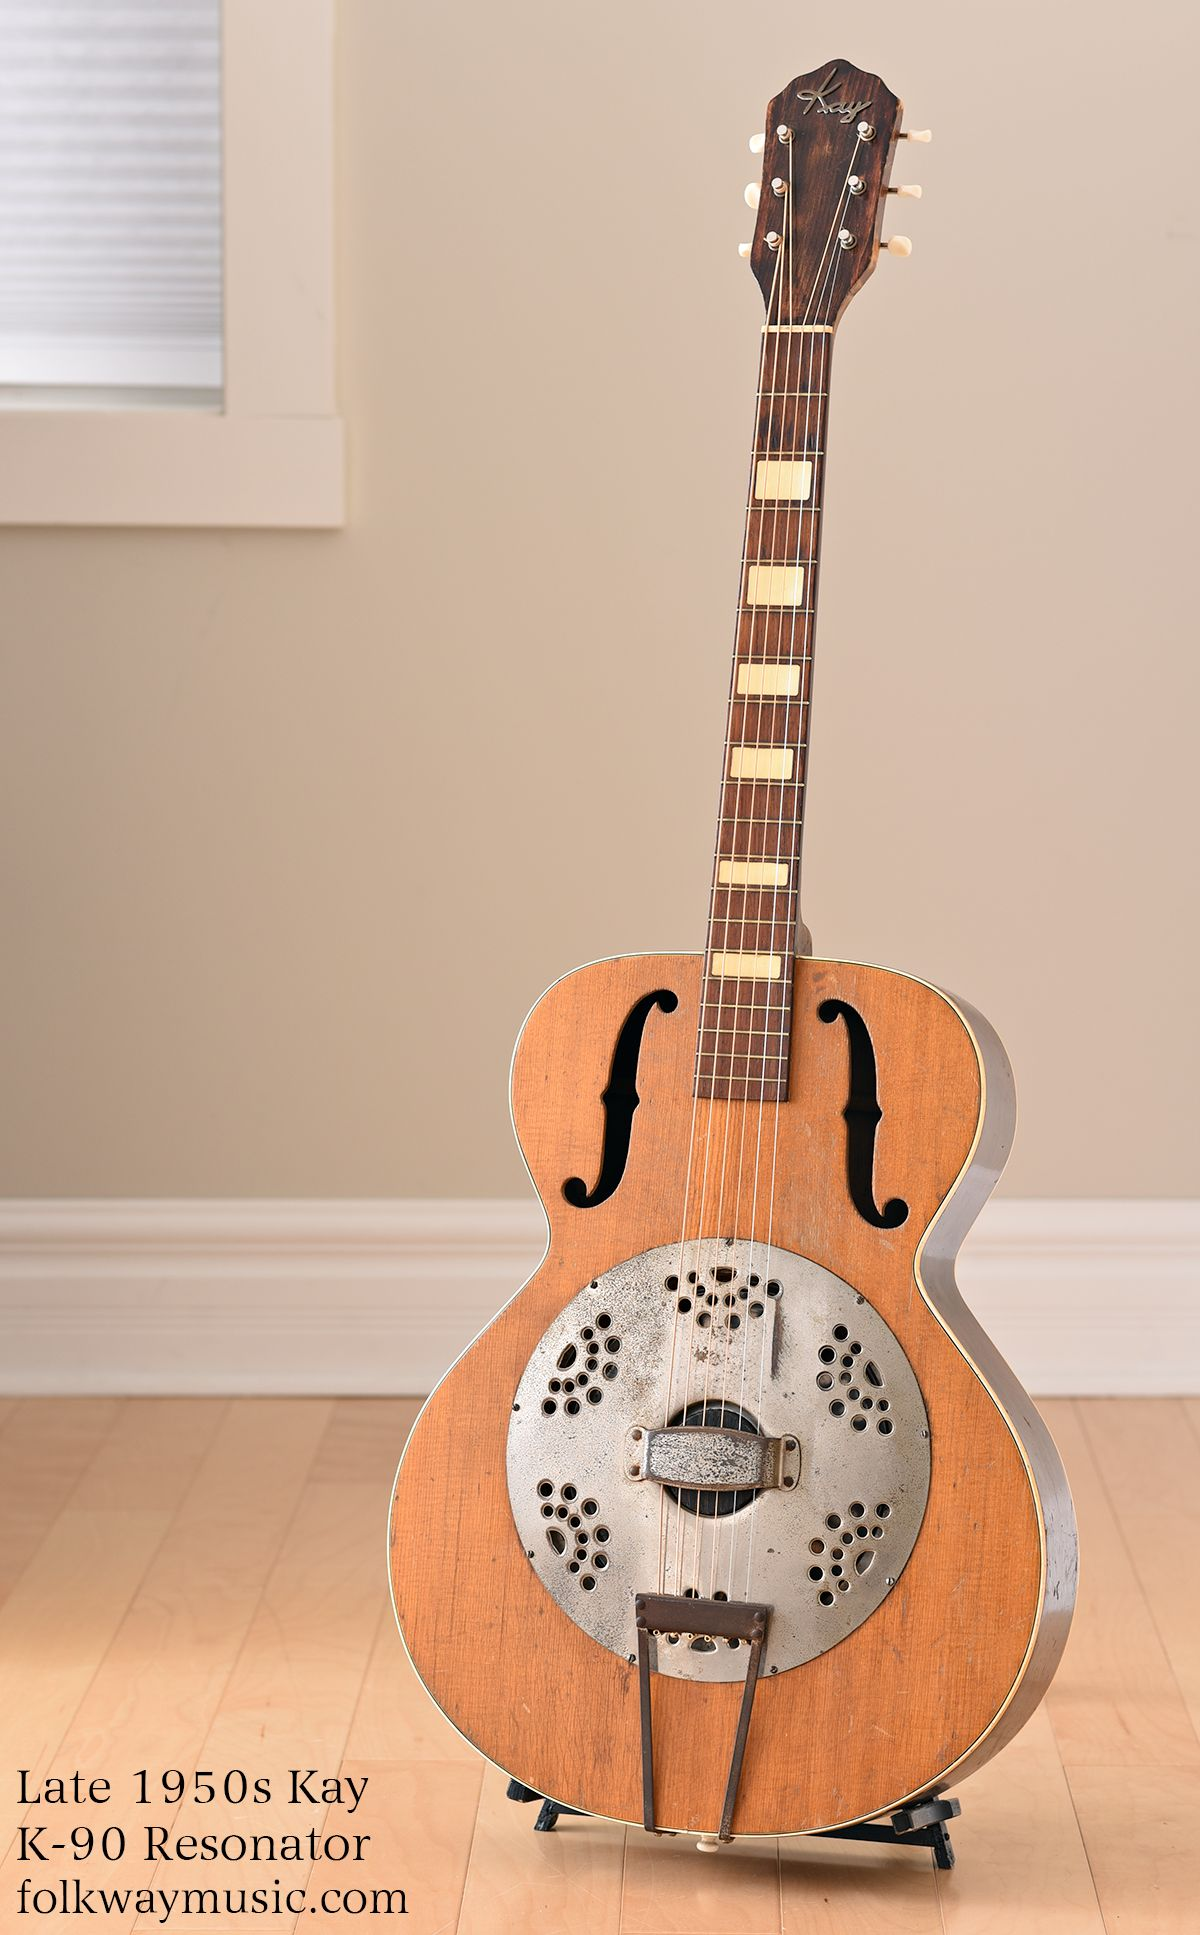 Late 50s Kay K 90 Resonator Guitar Vintage Guitars And New Guitars Ontario Canada Folkway Music Vintage And New Guit Resonator Guitar Guitar Steel Guitar